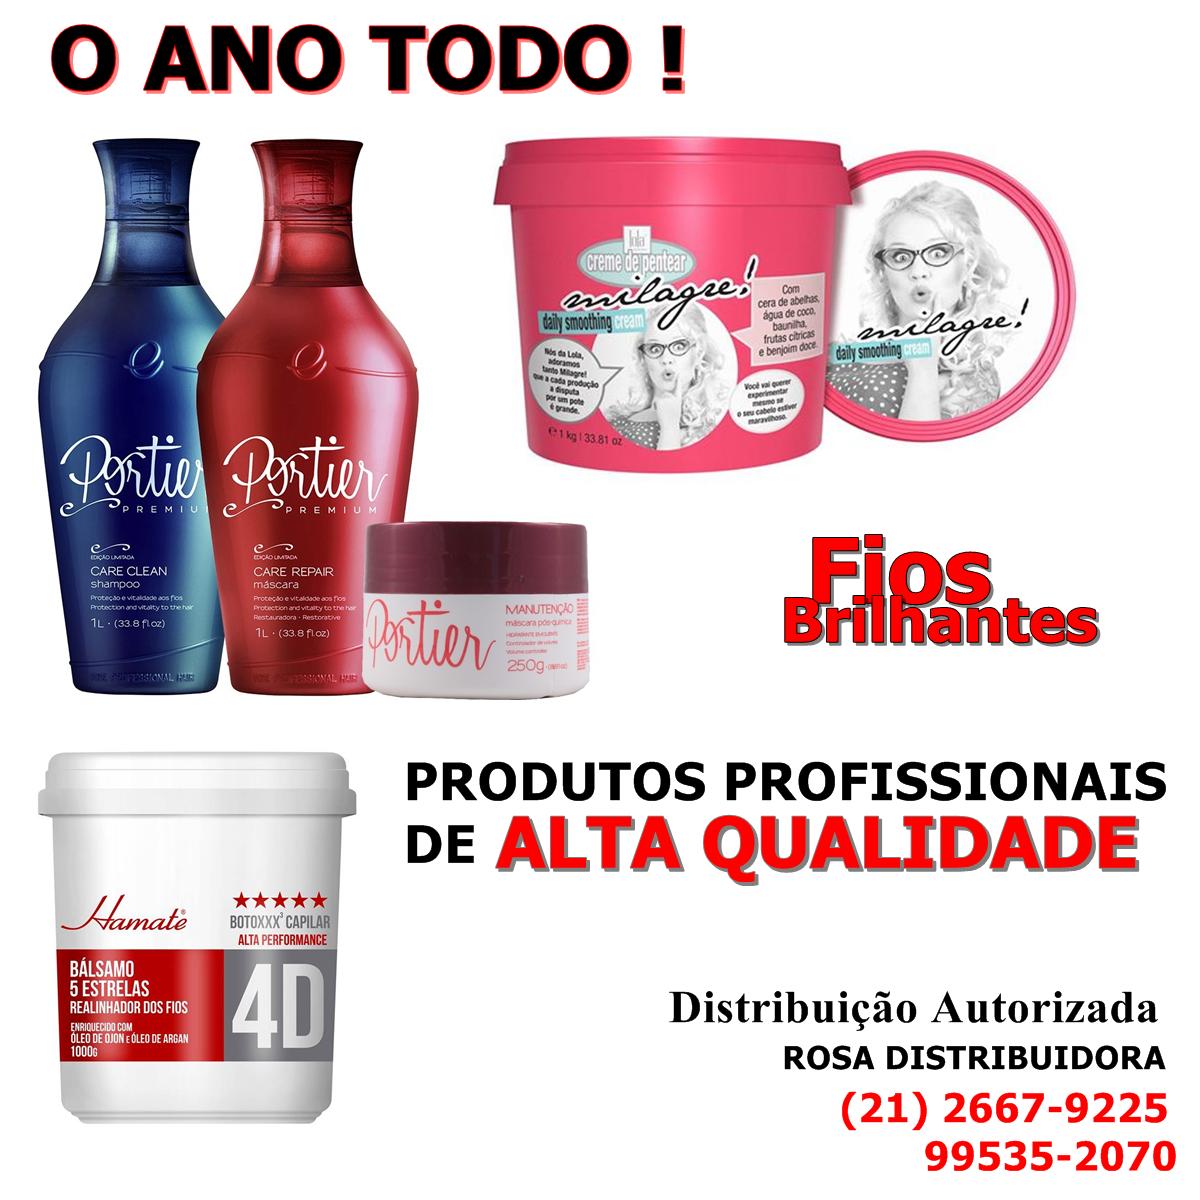 www.rosadistribuidora.com